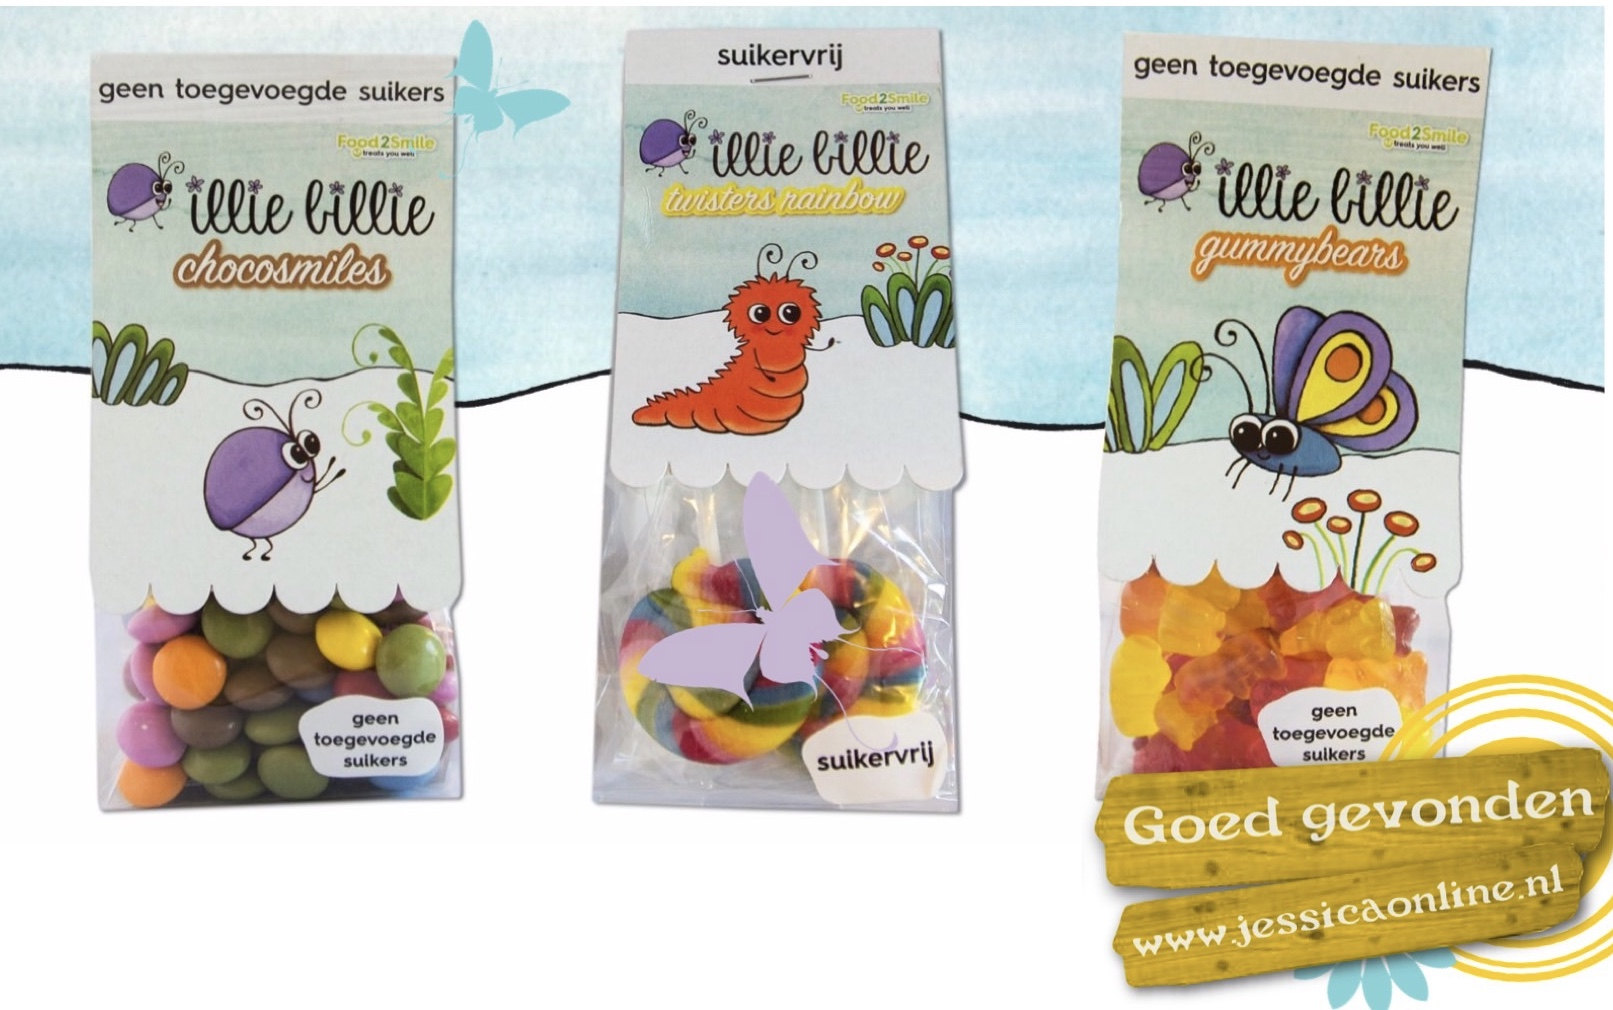 Illie Billie snoepjes van Food2Smile zonder toegevoegde suiker